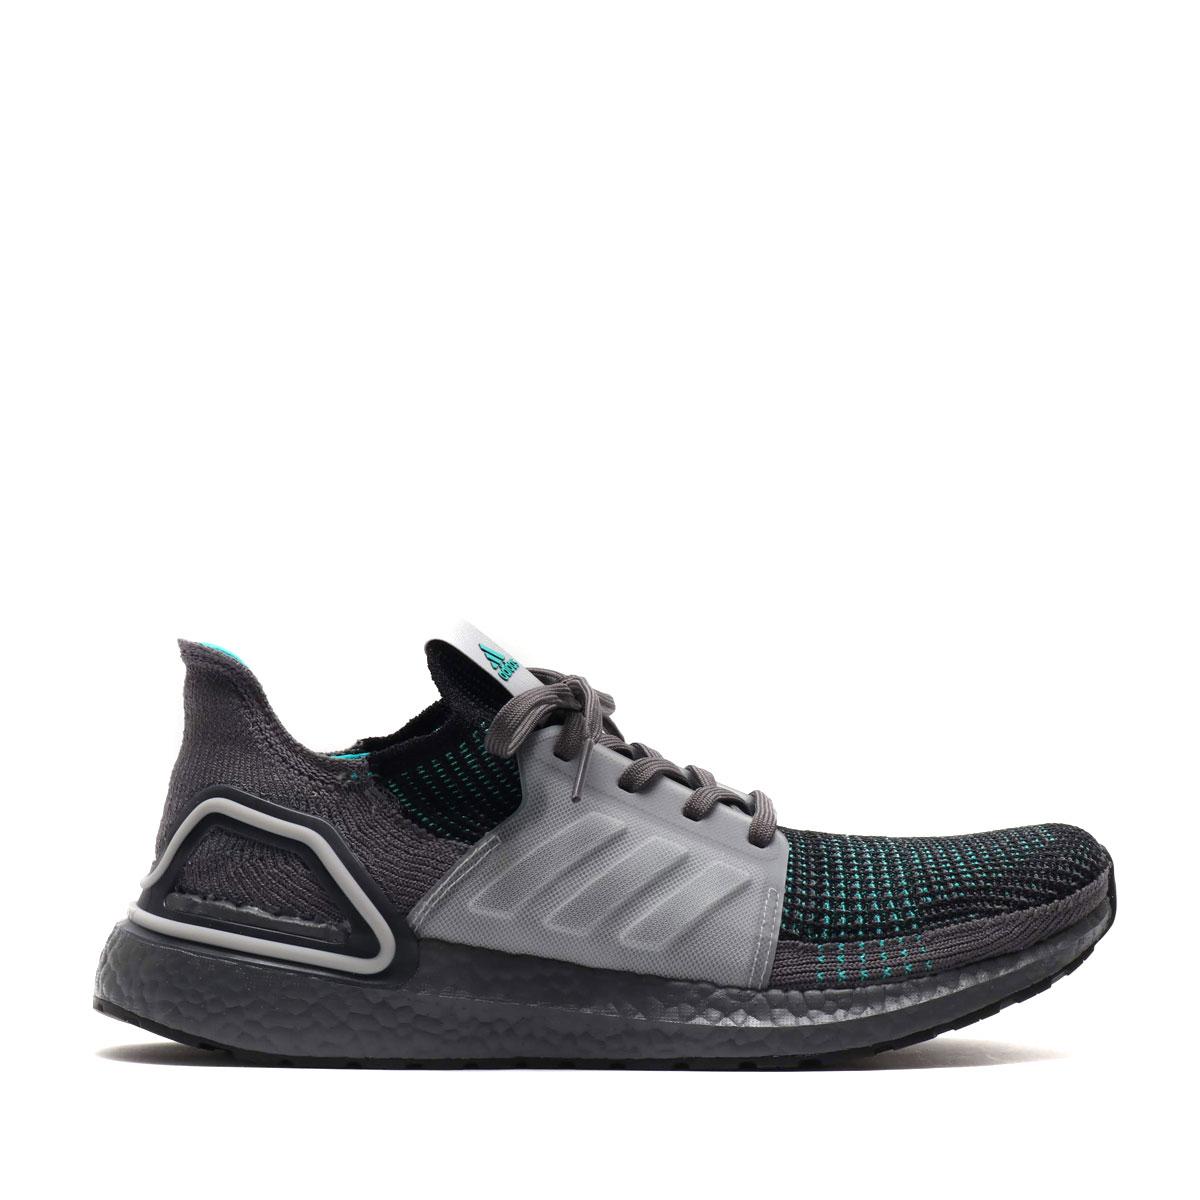 adidas UltraBOOST 19 (Adidas ultra boost 19) CORE BLACKGREY THREEGREY FIVE 19FW I